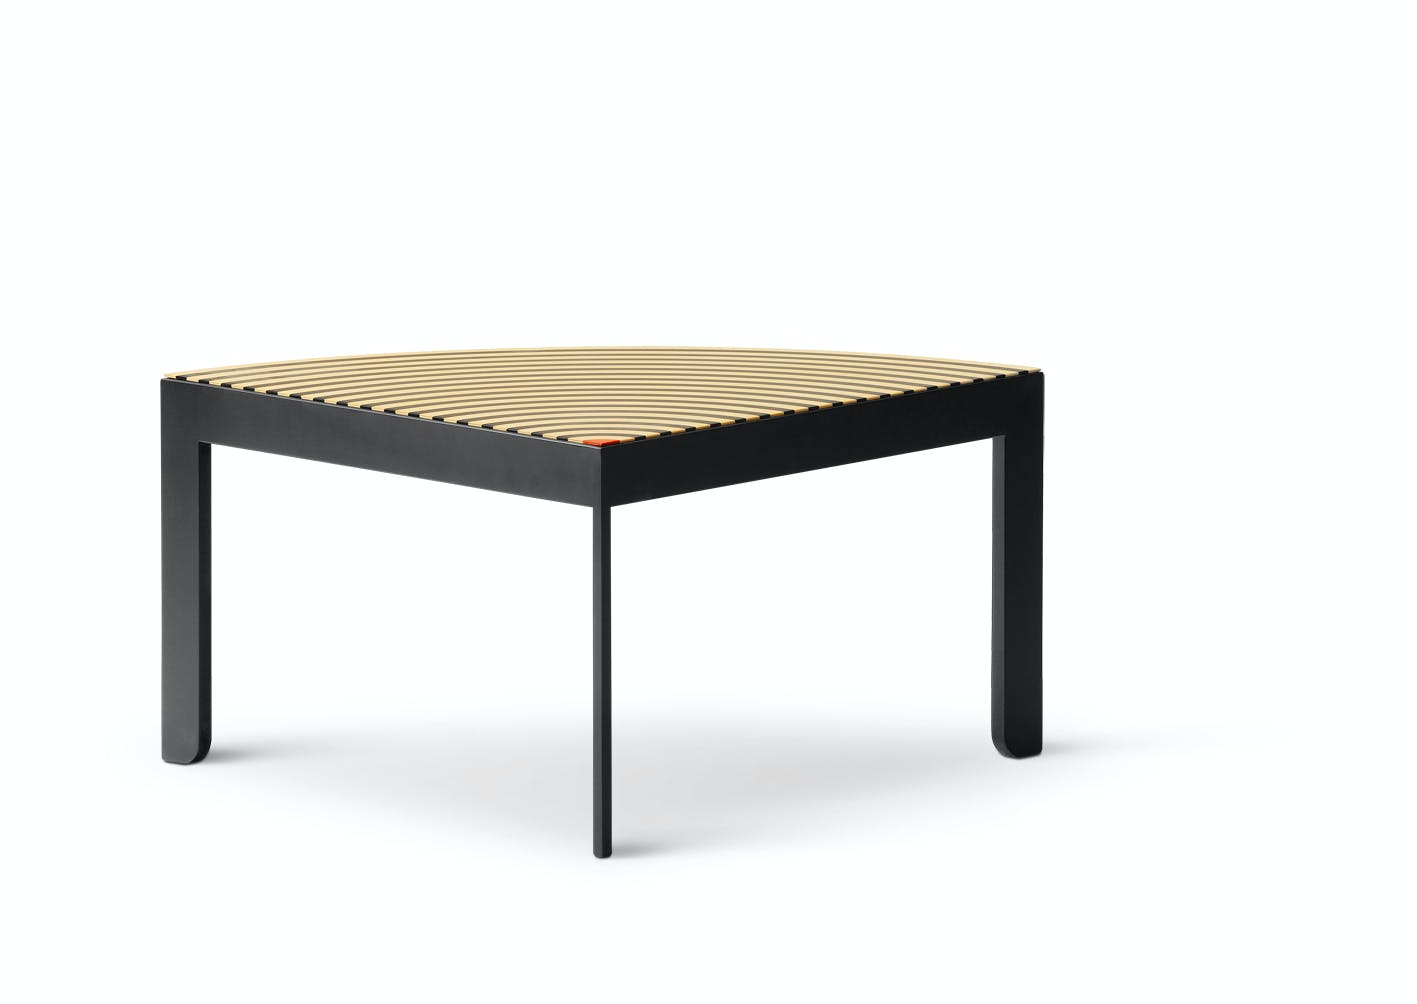 Nd 2601 V1 Mapleveneer Silkprint